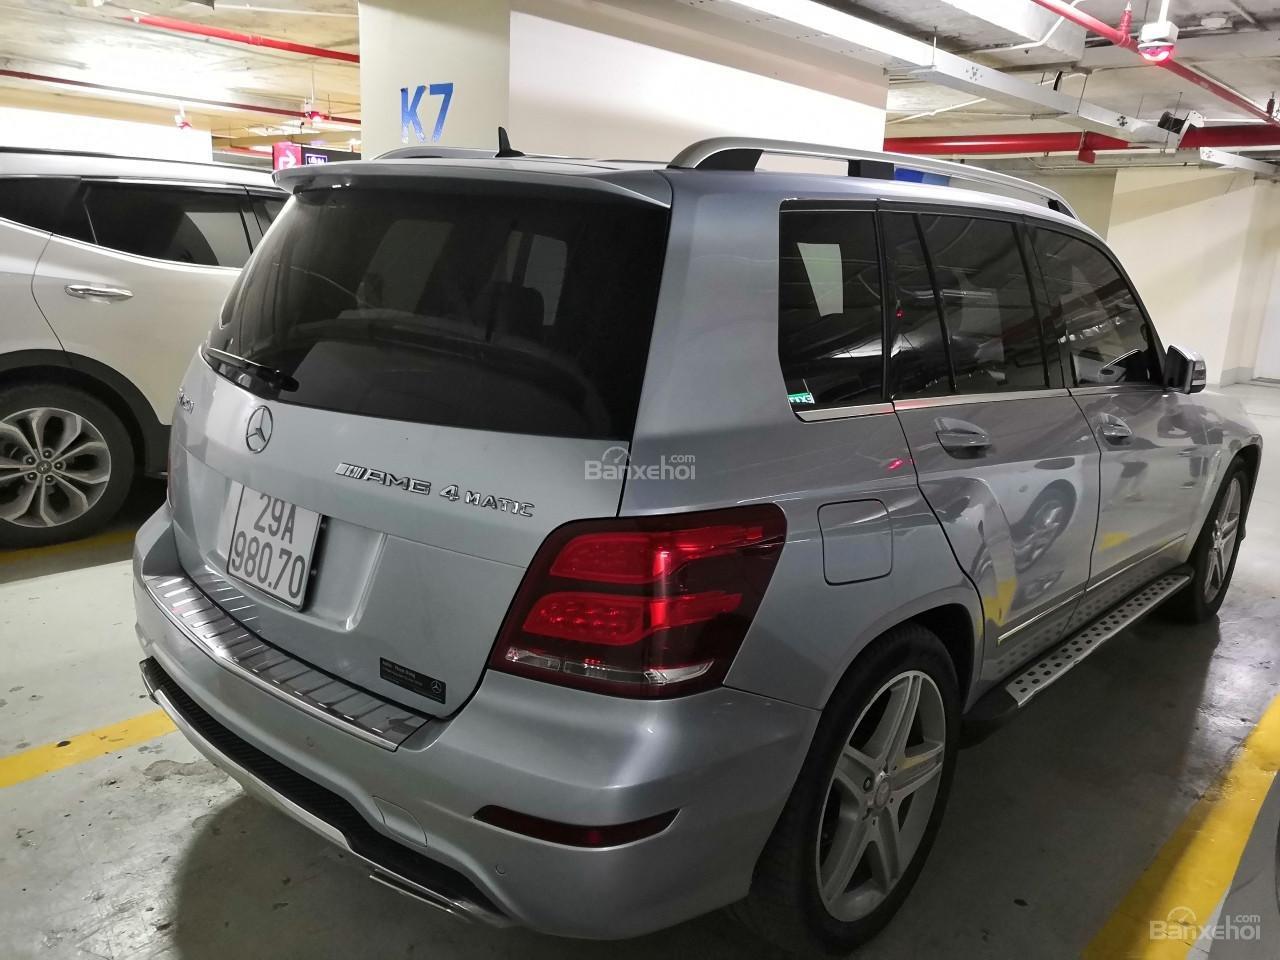 Cần bán xe Mercedes GLK Class năm sản xuất 2013-2